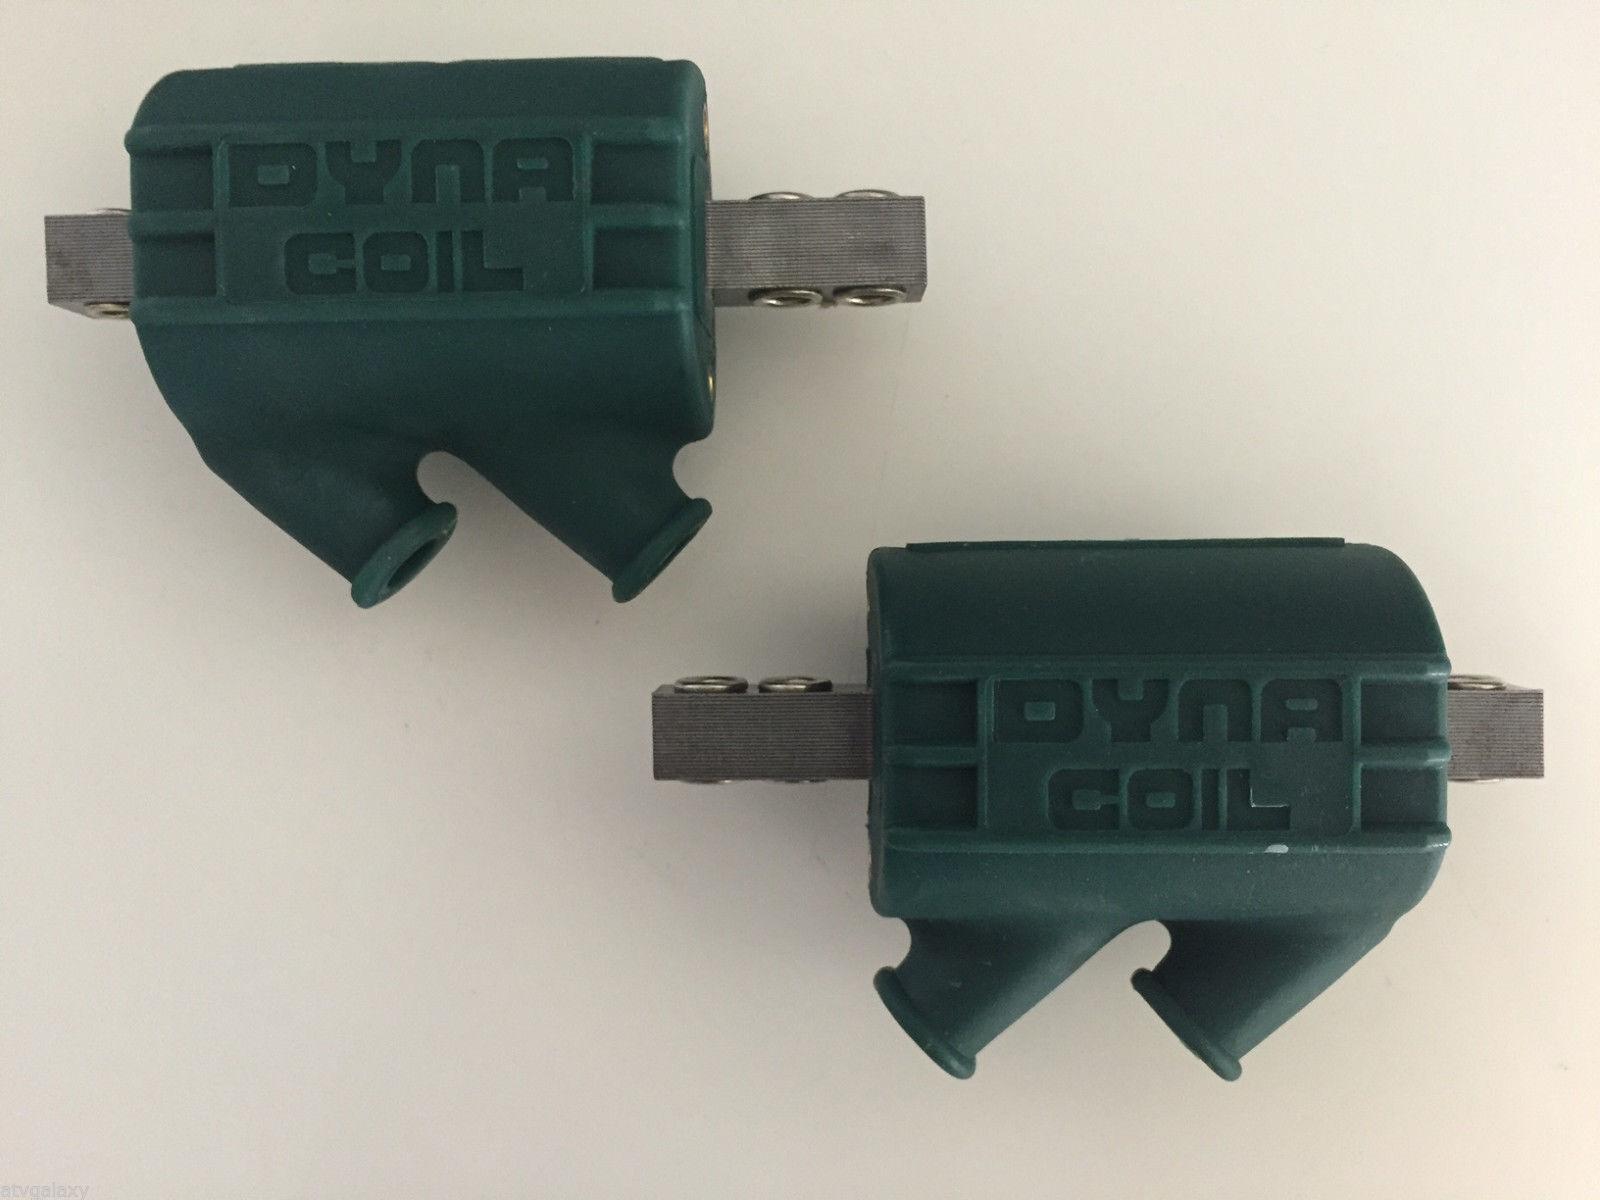 Dyna Ignition Coils 3 ohm Dual Output DC1-1 Wires DW-200 Suzuki GS750 GS 750 77